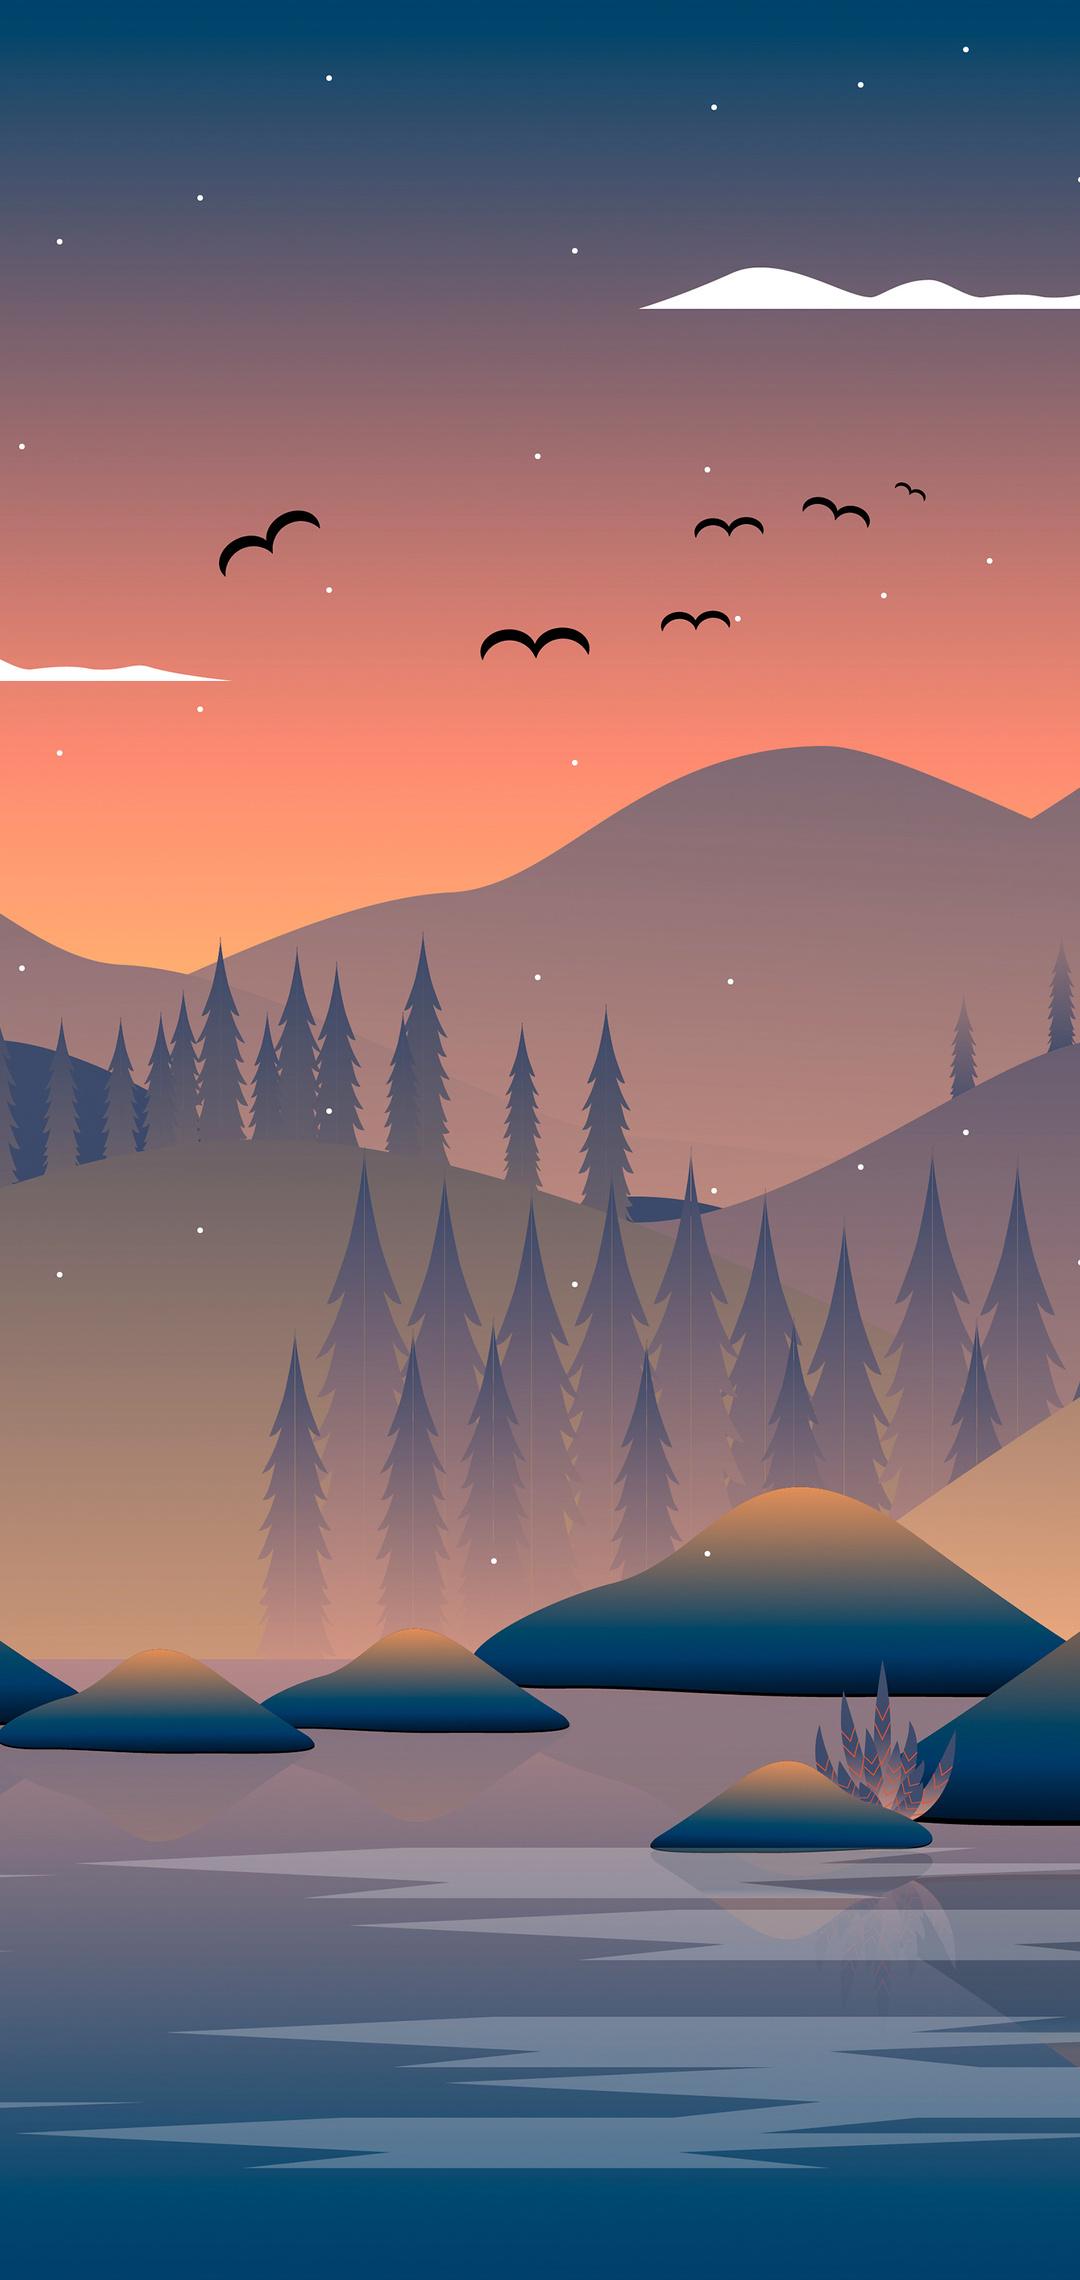 mountains-birds-tree-minimal-5k-76.jpg